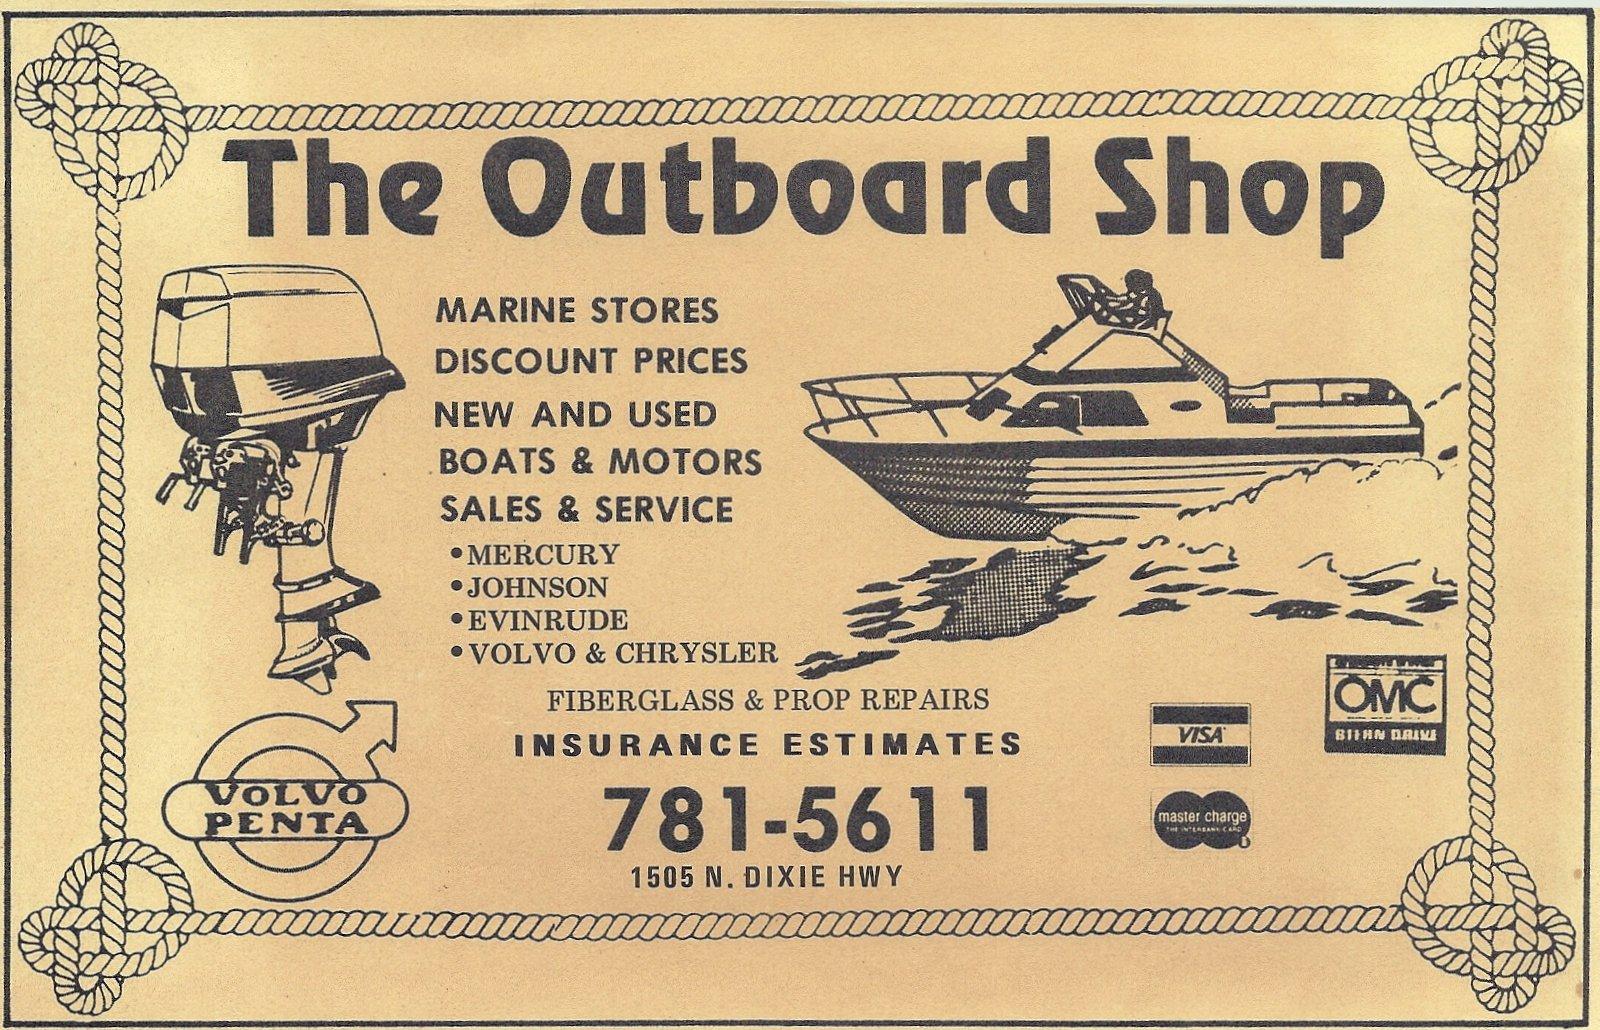 OutboardShop_OldAd2